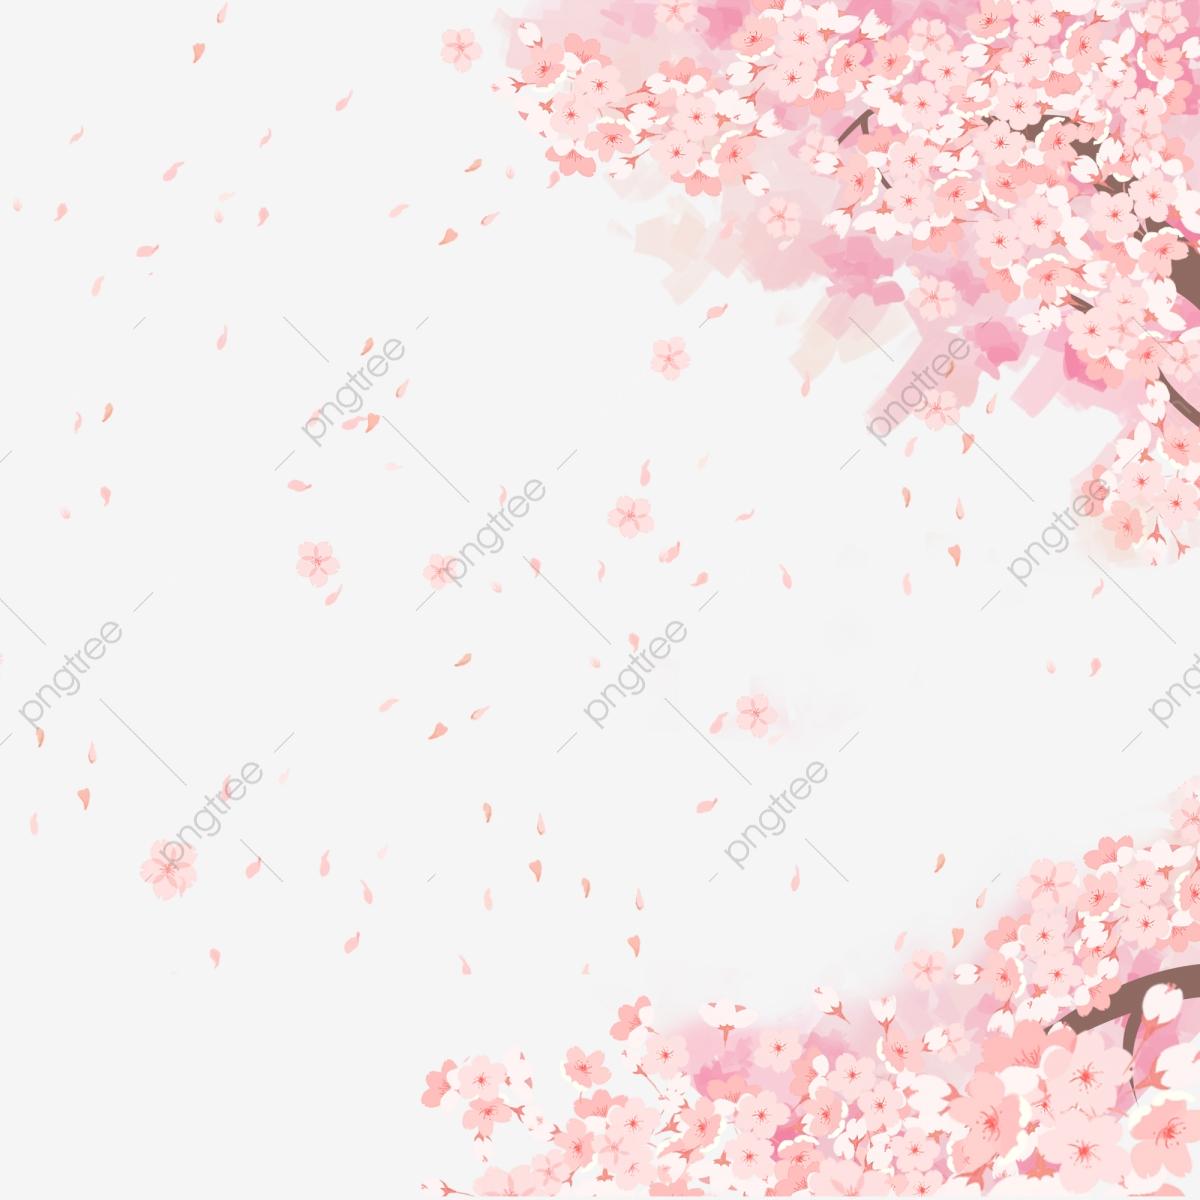 Cherry Blossom Romantic Sakura Petal Cherry Blossom Petals, Cherry.